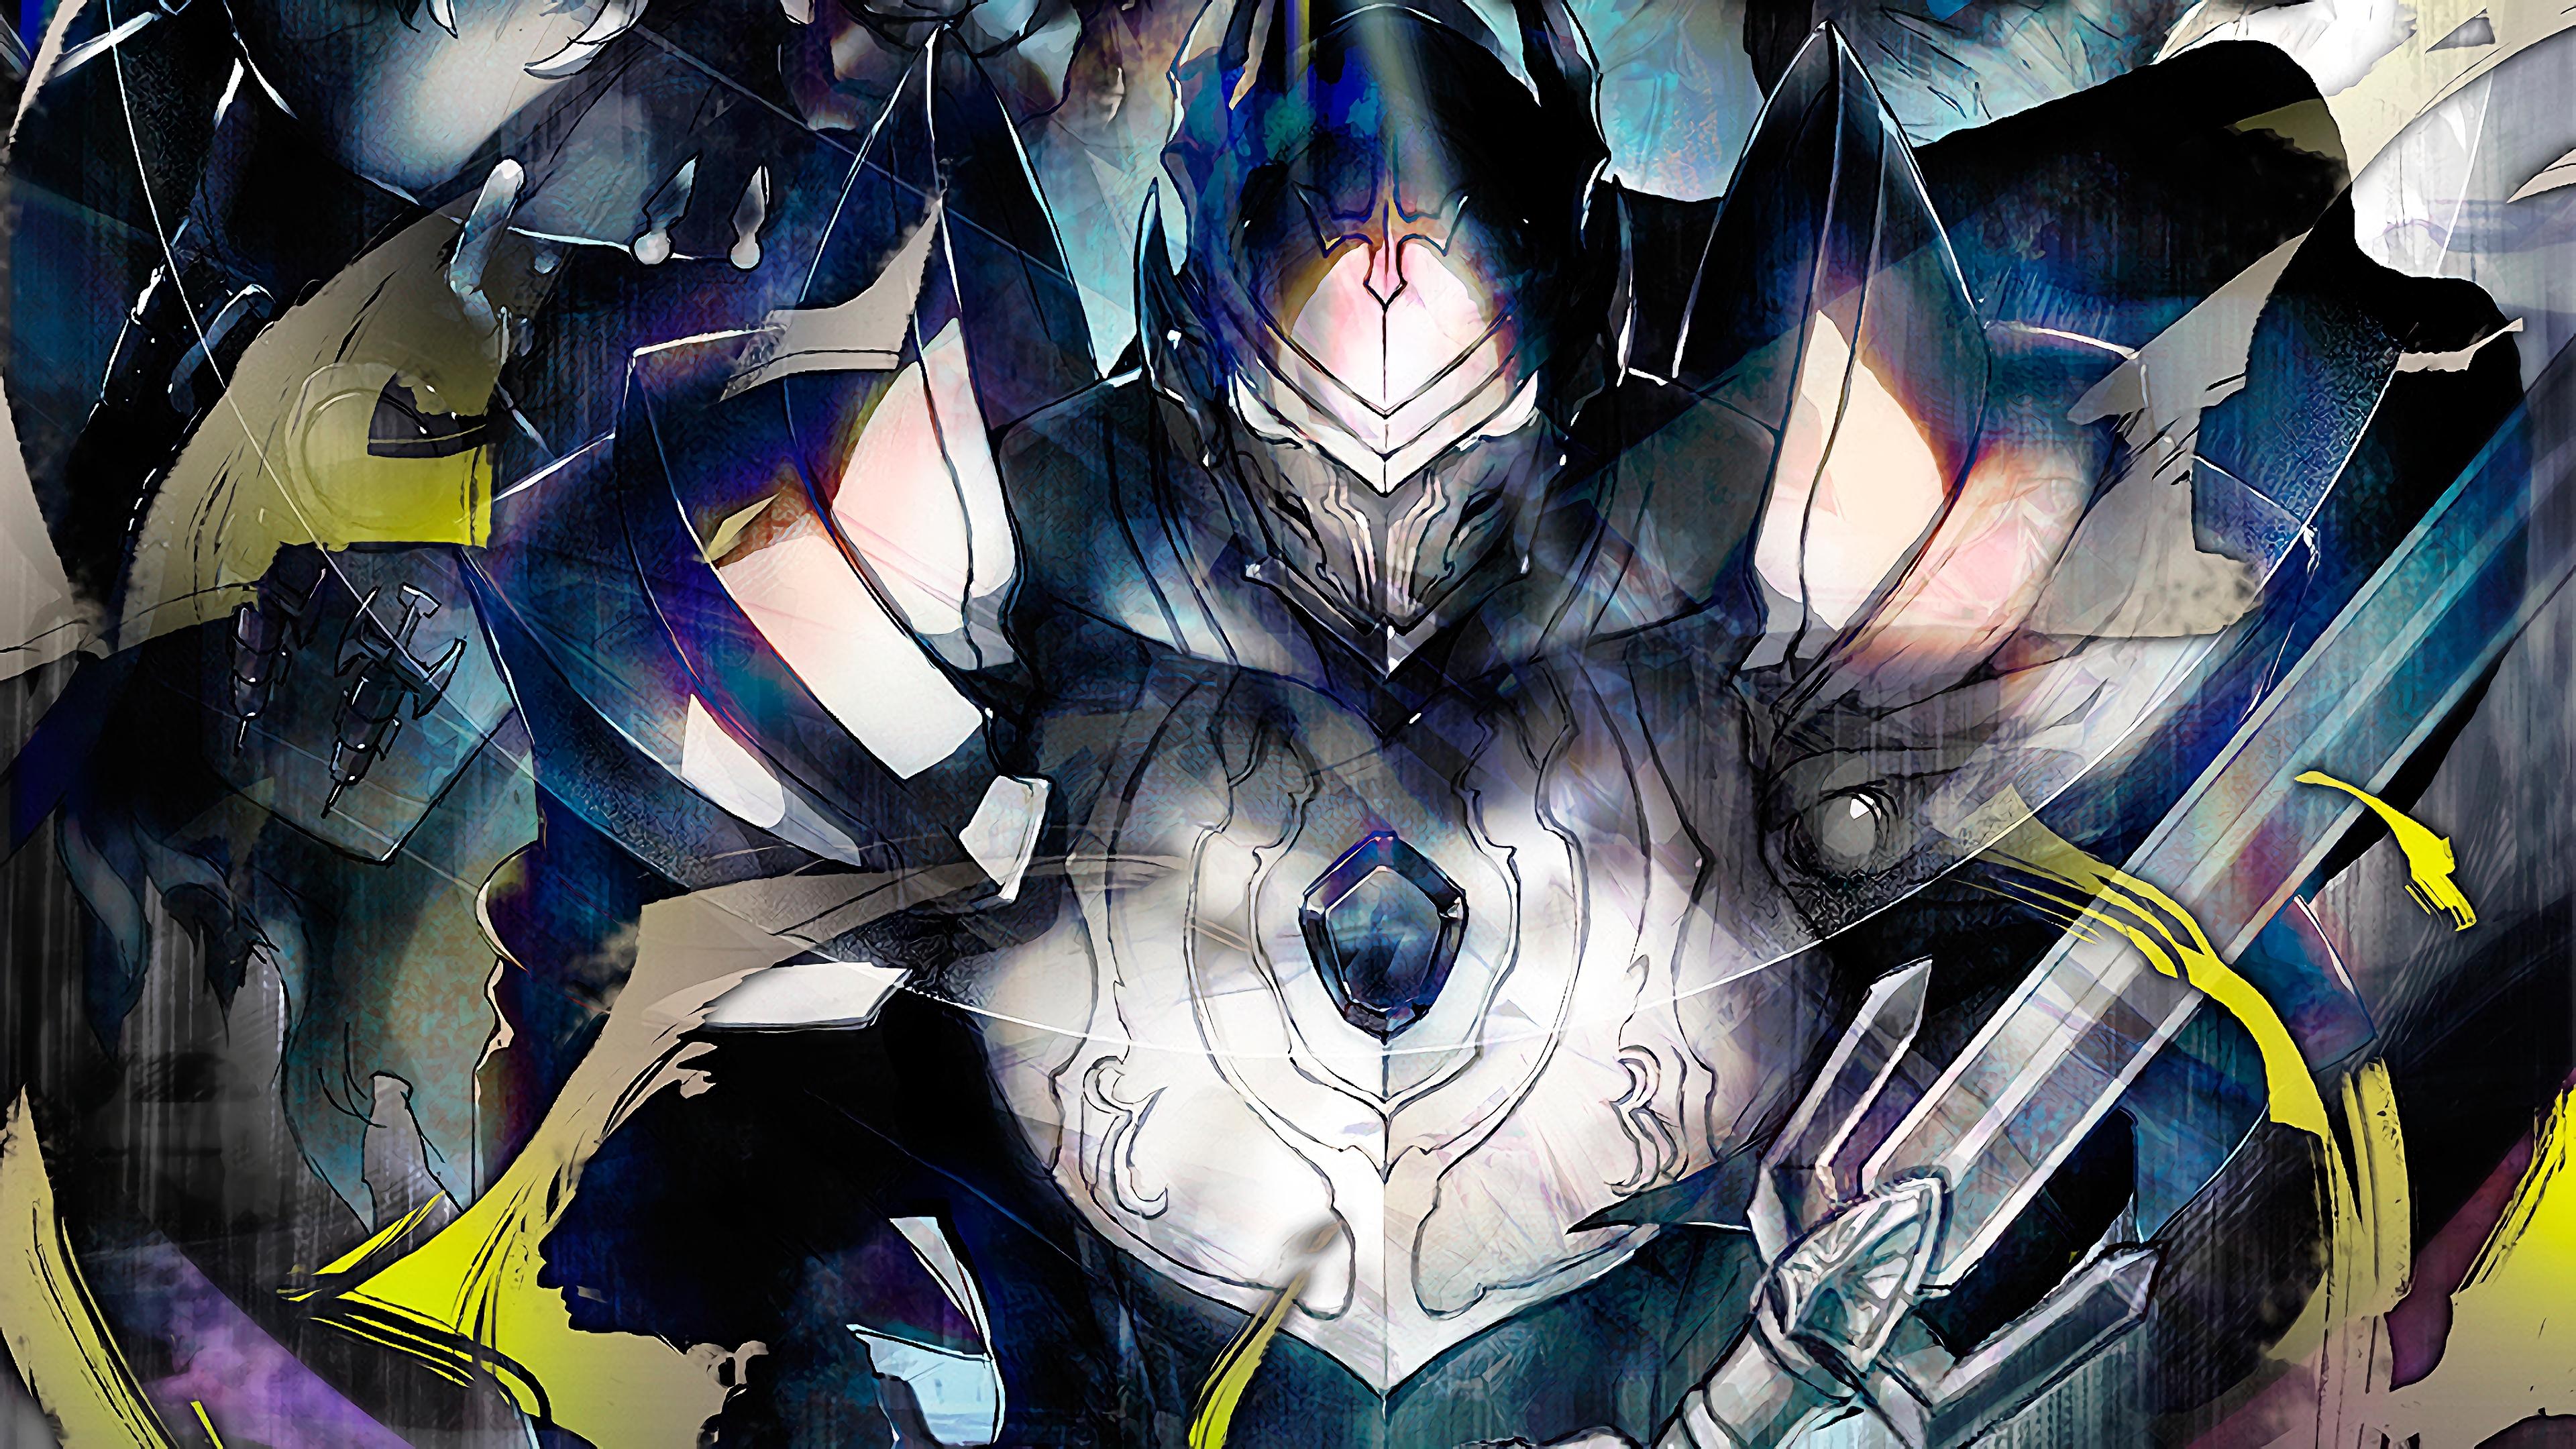 Unduh 900 Wallpaper Anime Overlord 4k HD Gratis